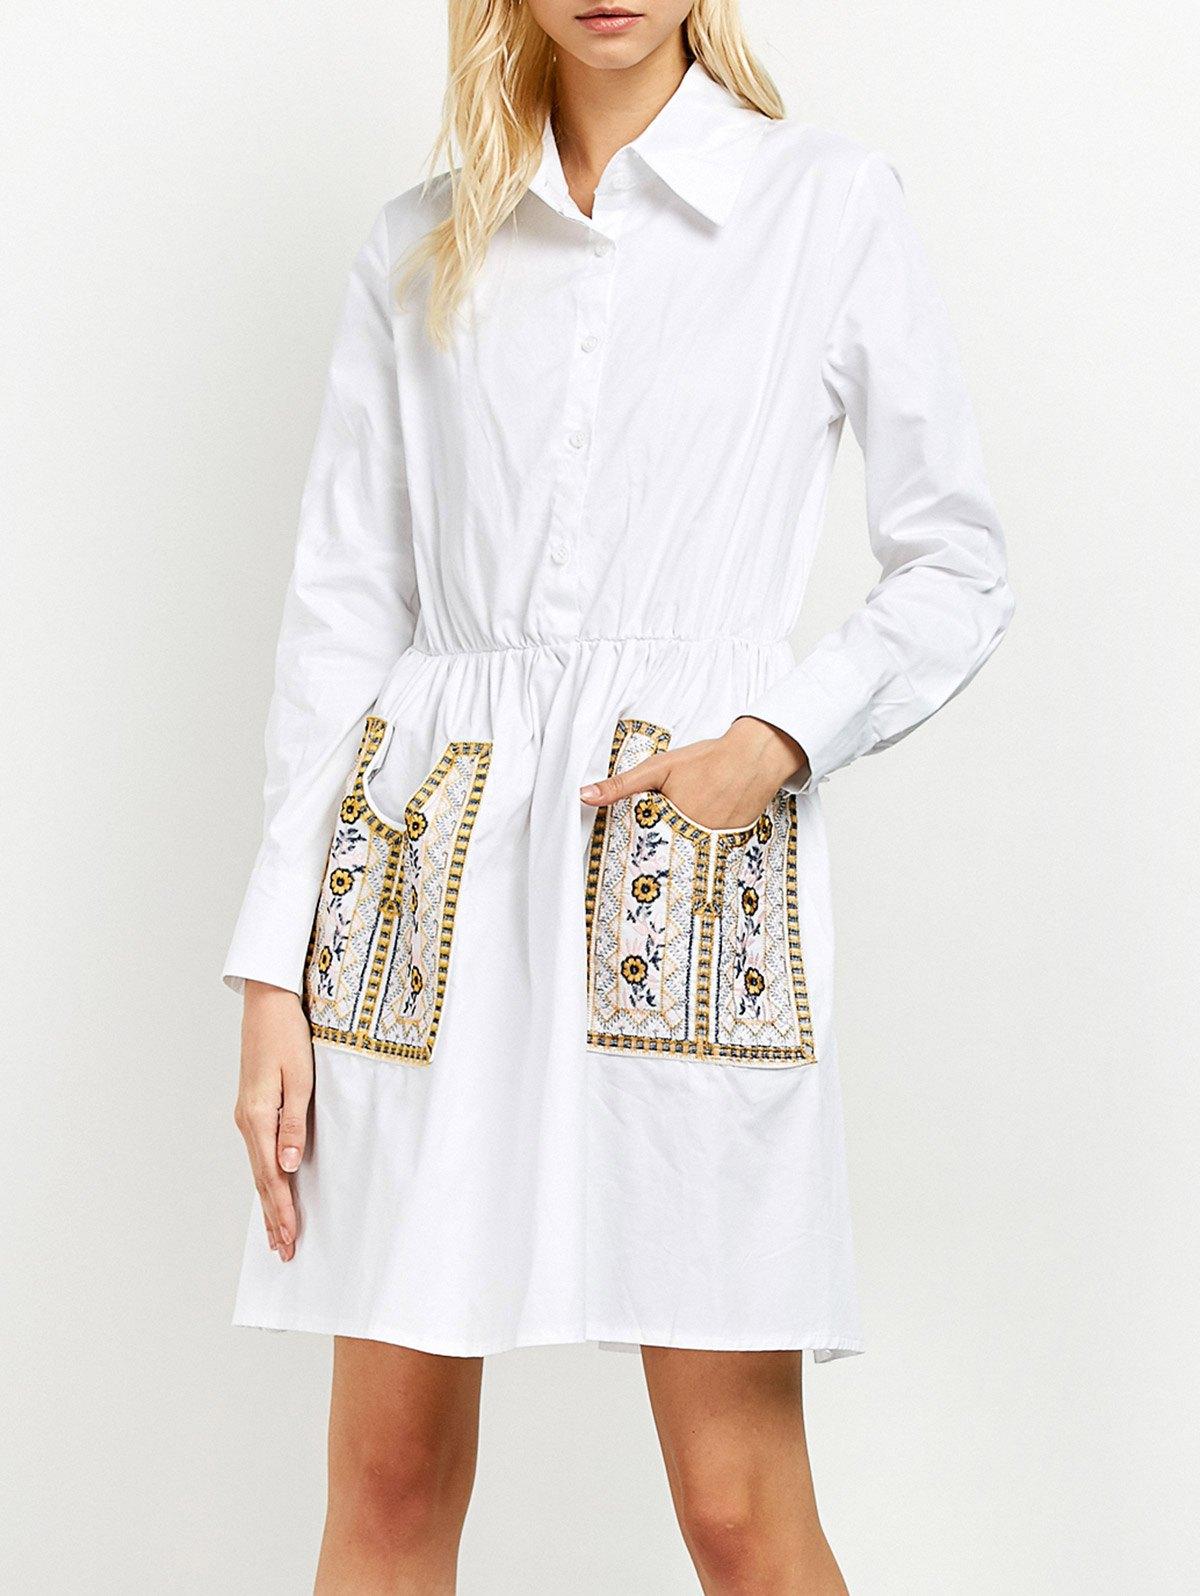 Long Sleeve Embroidered Pockets Shirt DressClothes<br><br><br>Size: L<br>Color: WHITE